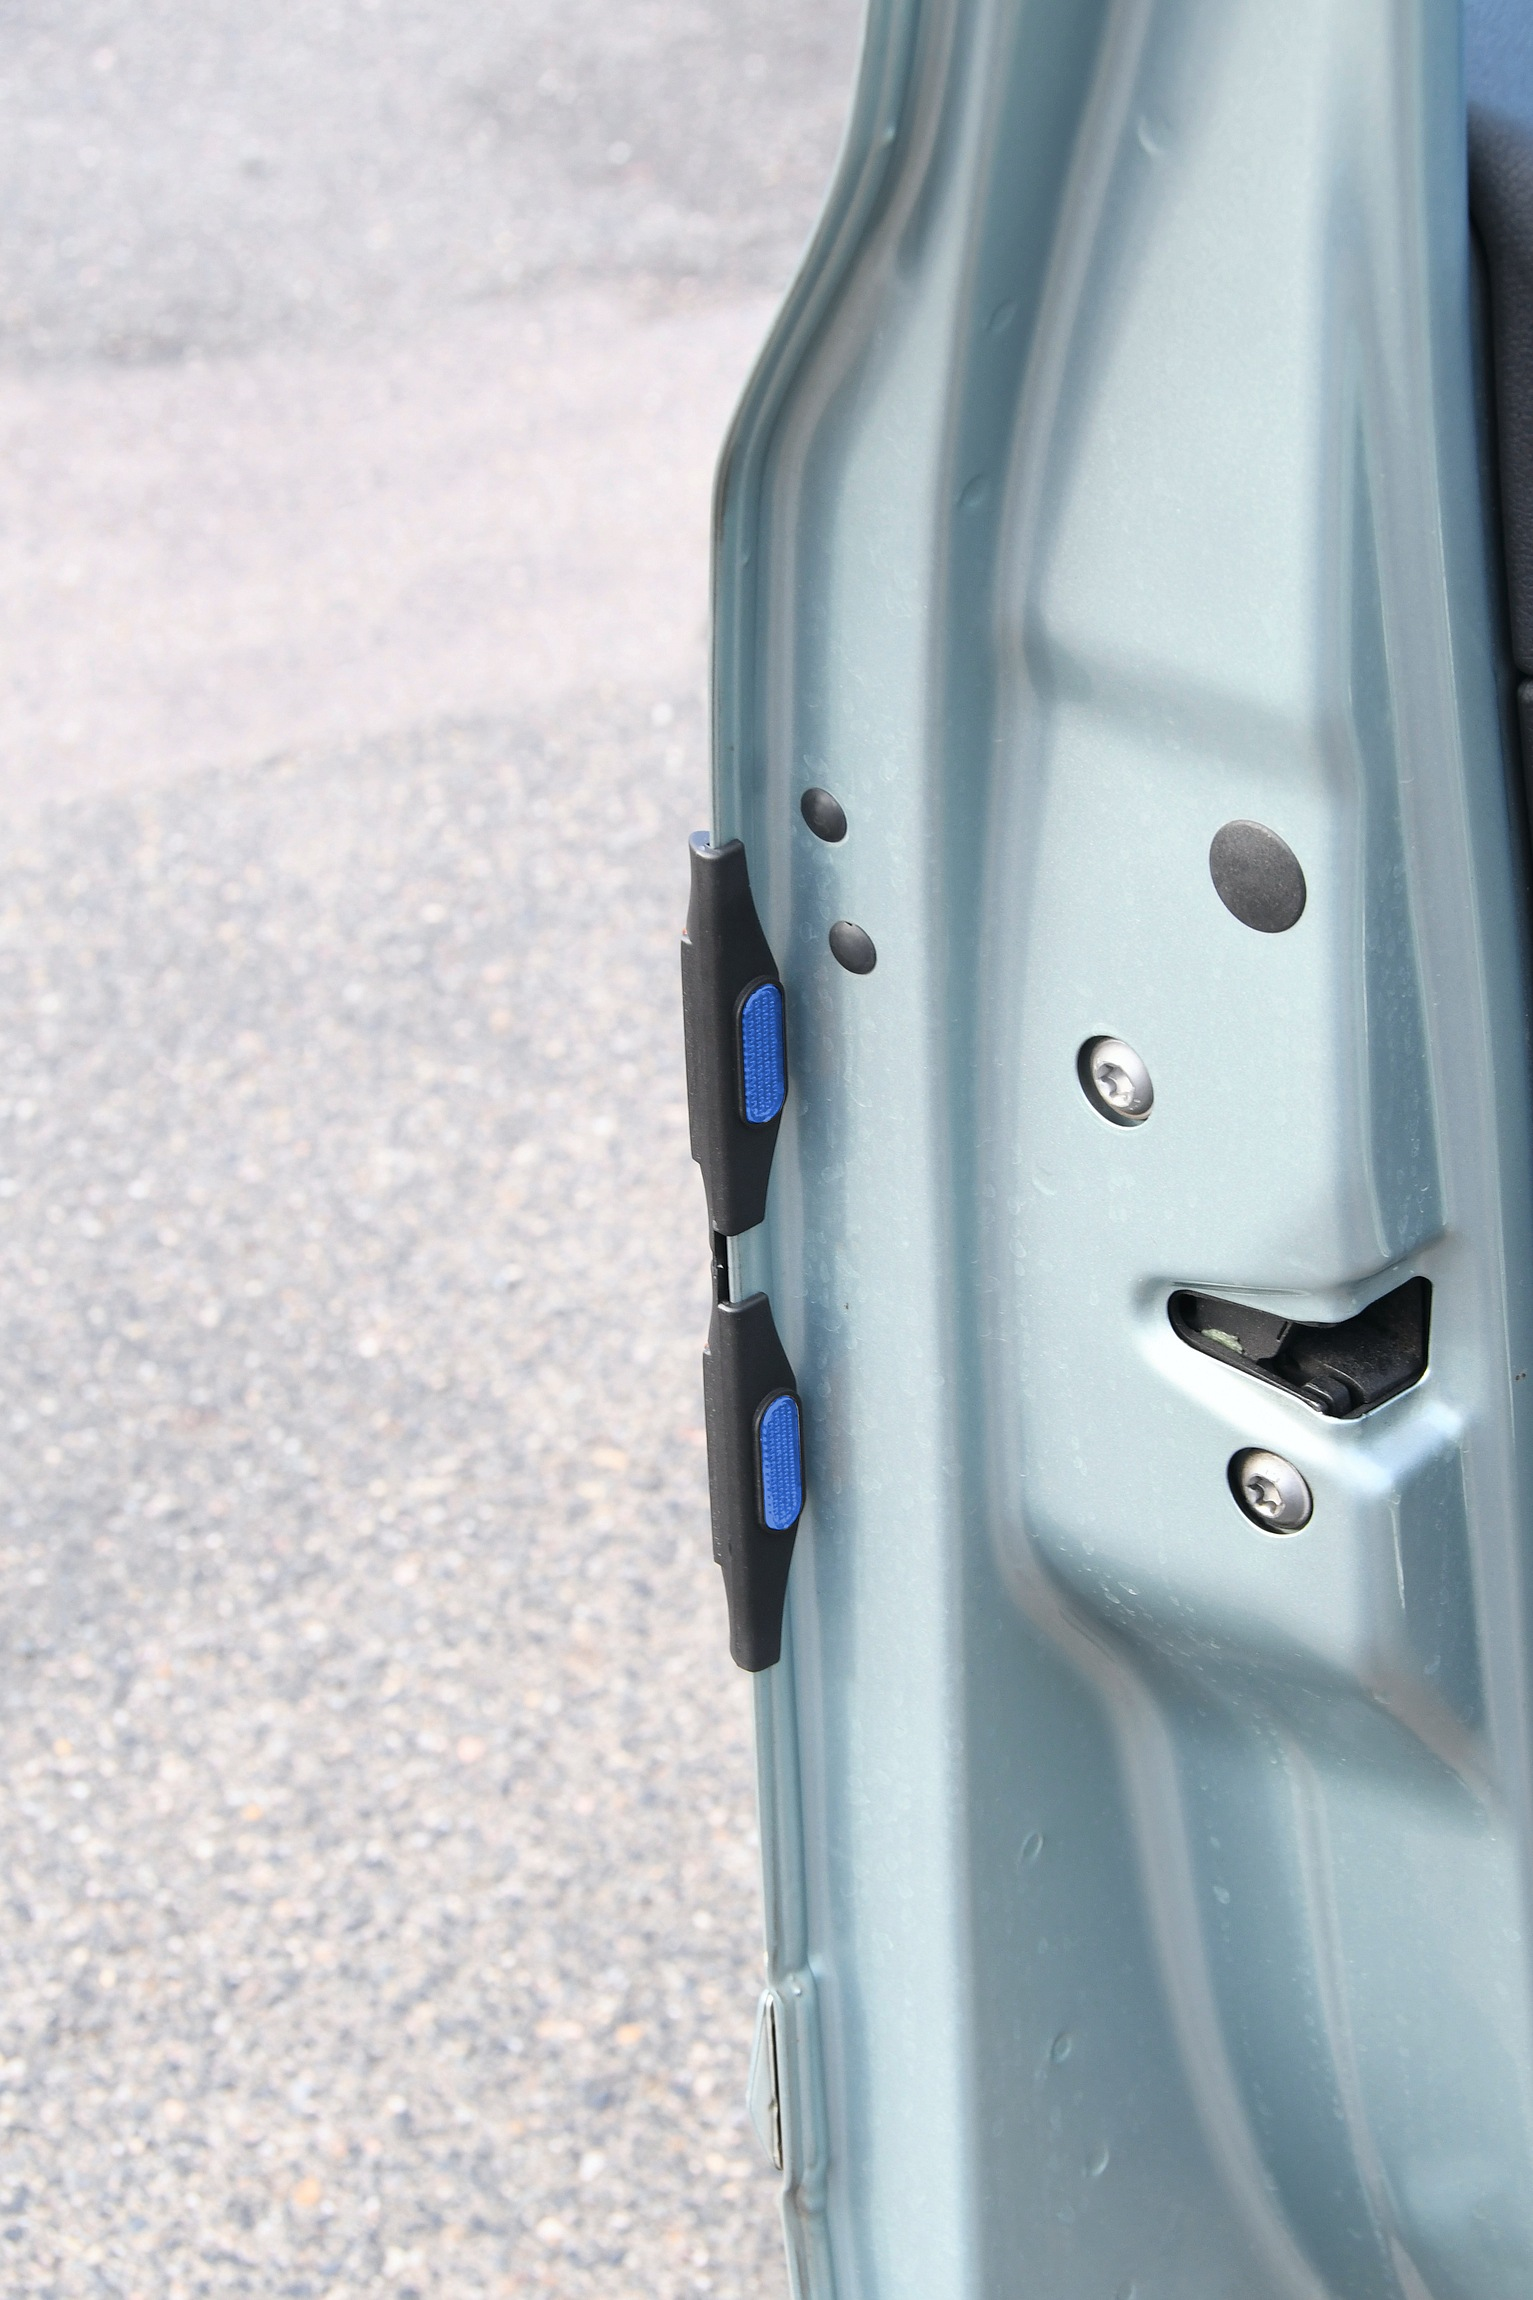 Chránič dveří modrý 2ks